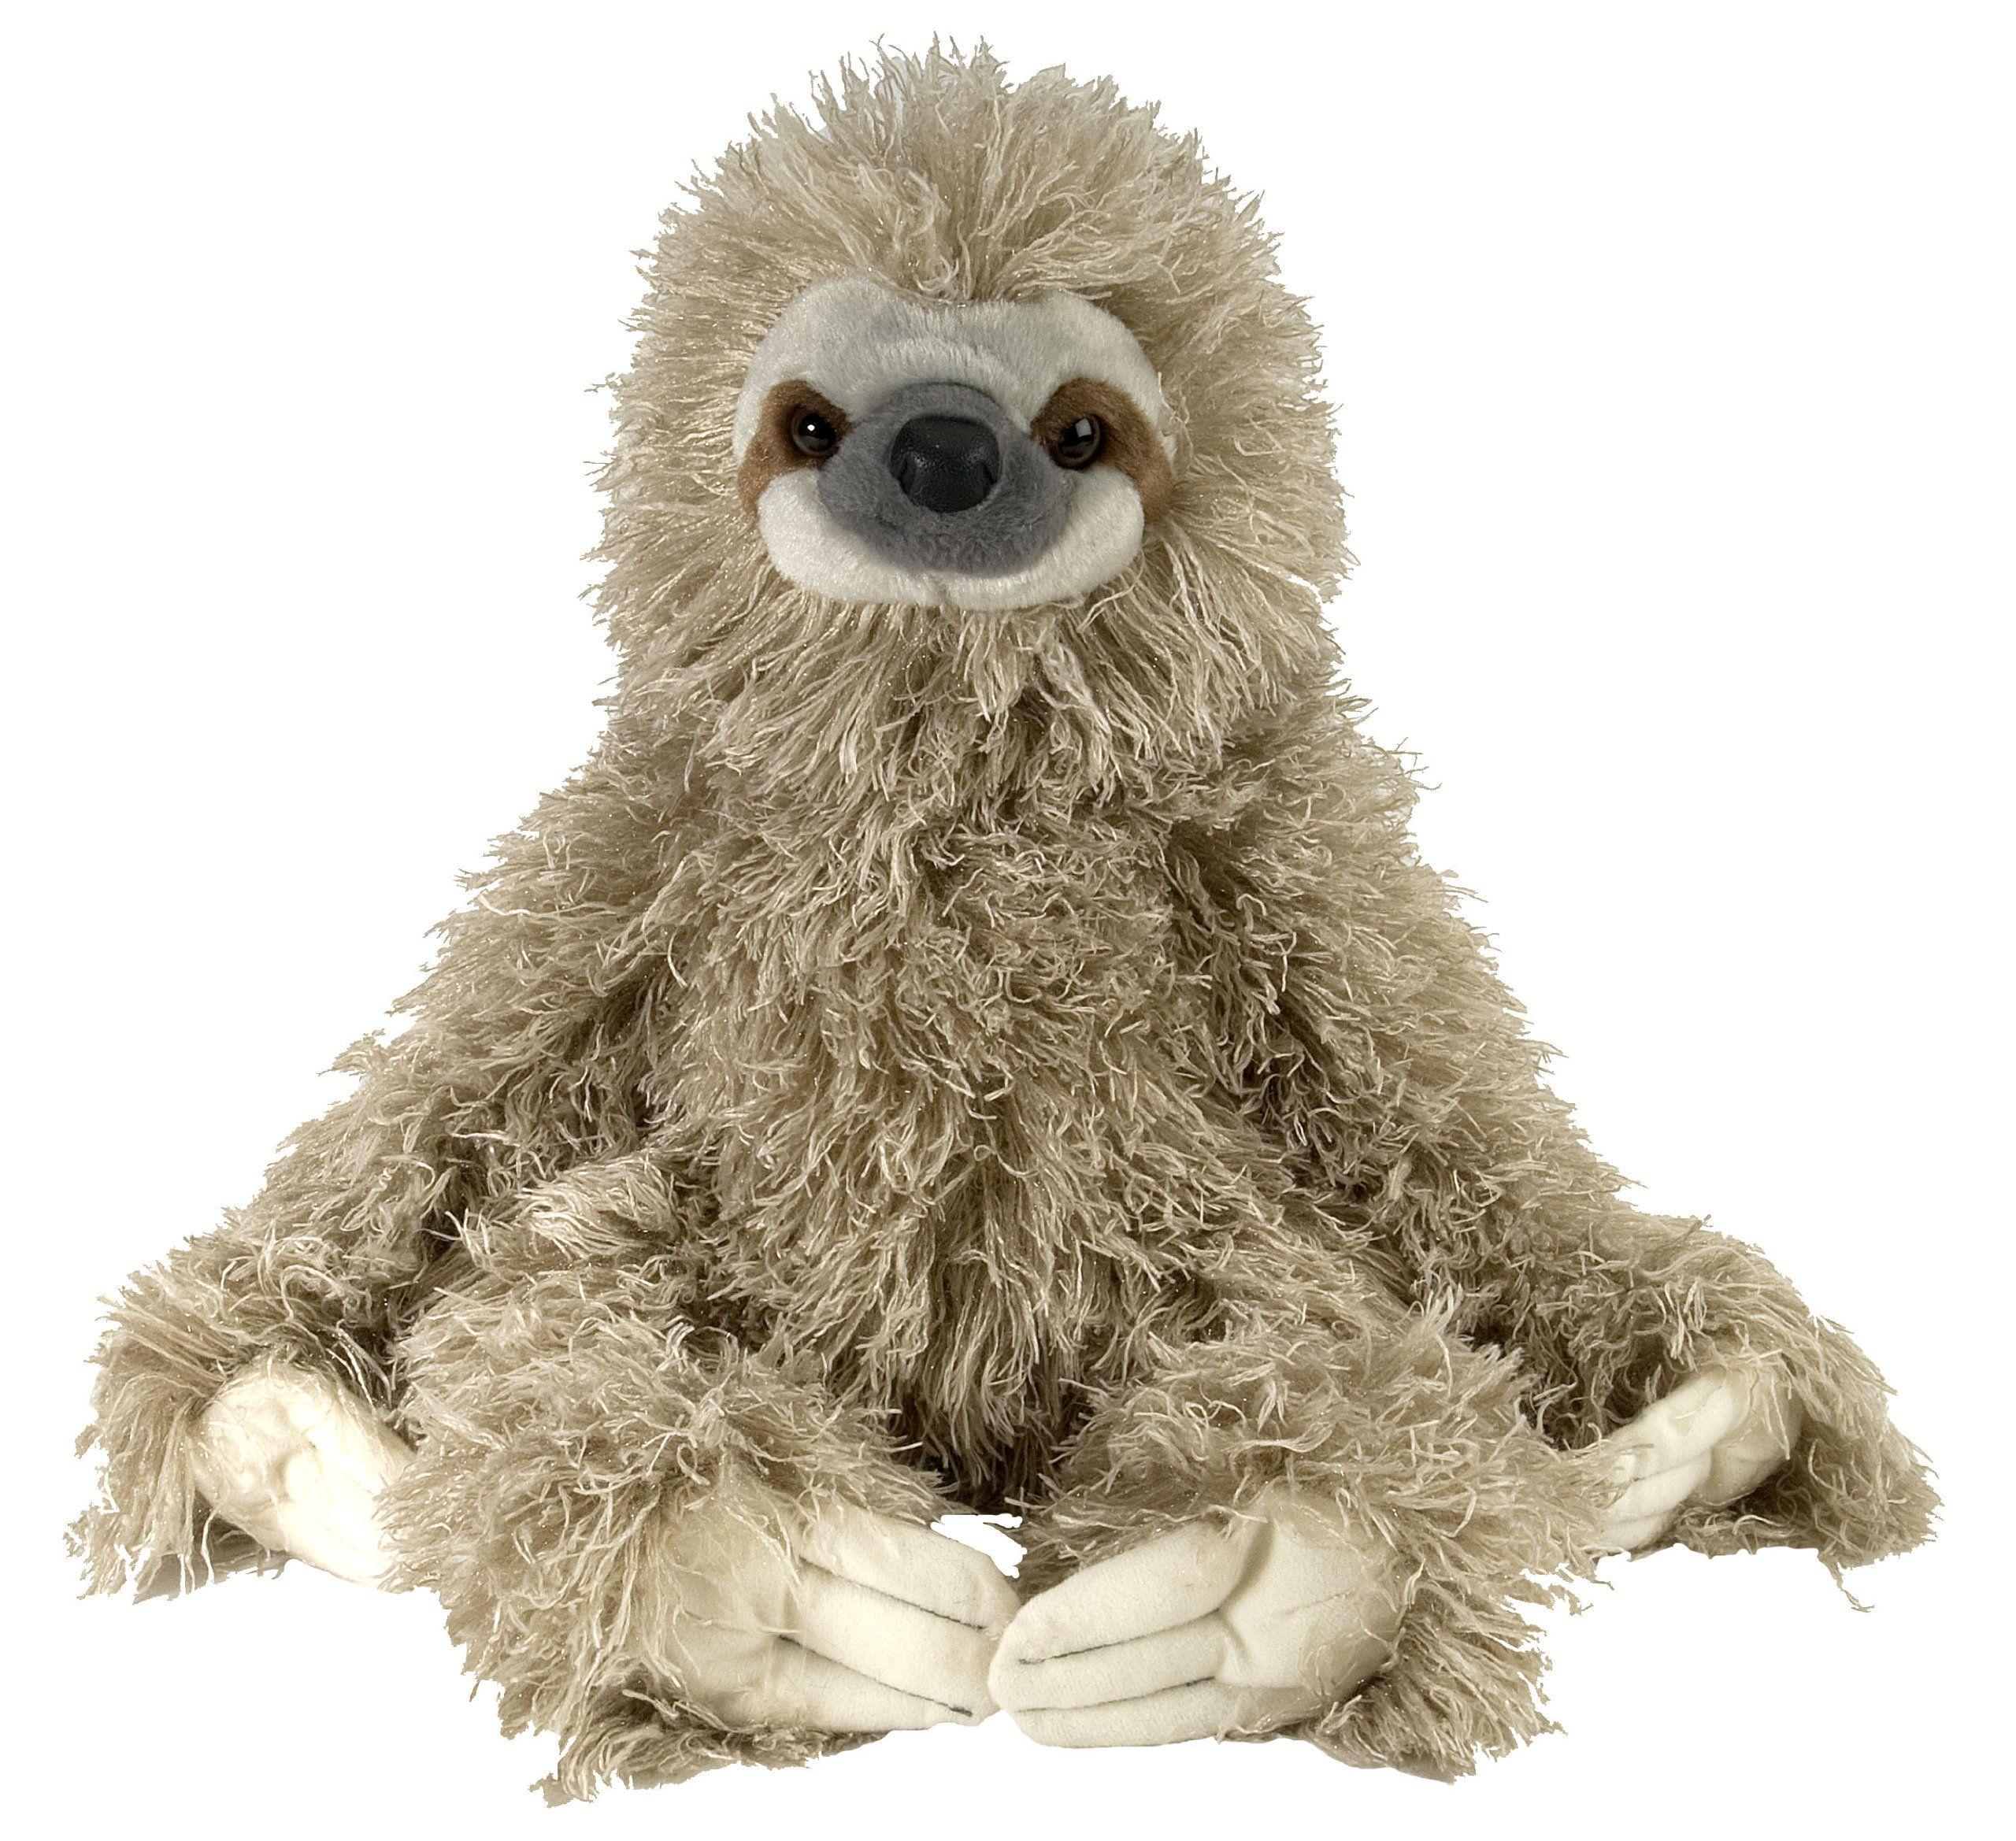 Sloth going to the bathroom - Amazon Com Wild Republic Cuddlekin Three Toed Sloth 12 Plush Toys